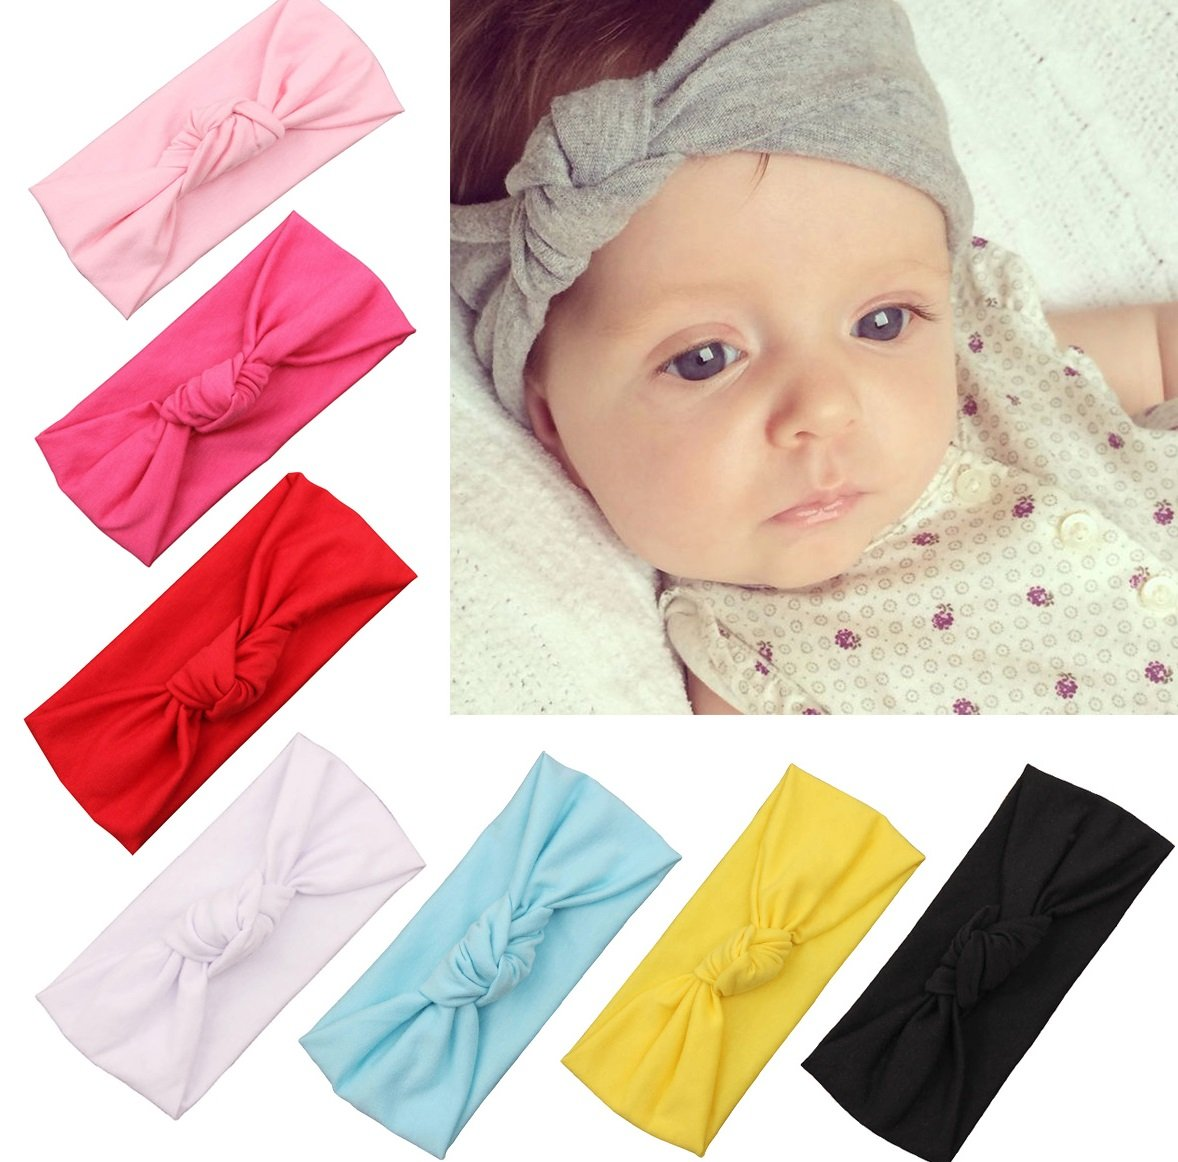 Naisidier Baby Girl Headbands Newborn Toddlers Headwear, Cute Head Wrap with Hair Bow Cute Bunny Ears Hair Bow zq-13332_201-31-1531384